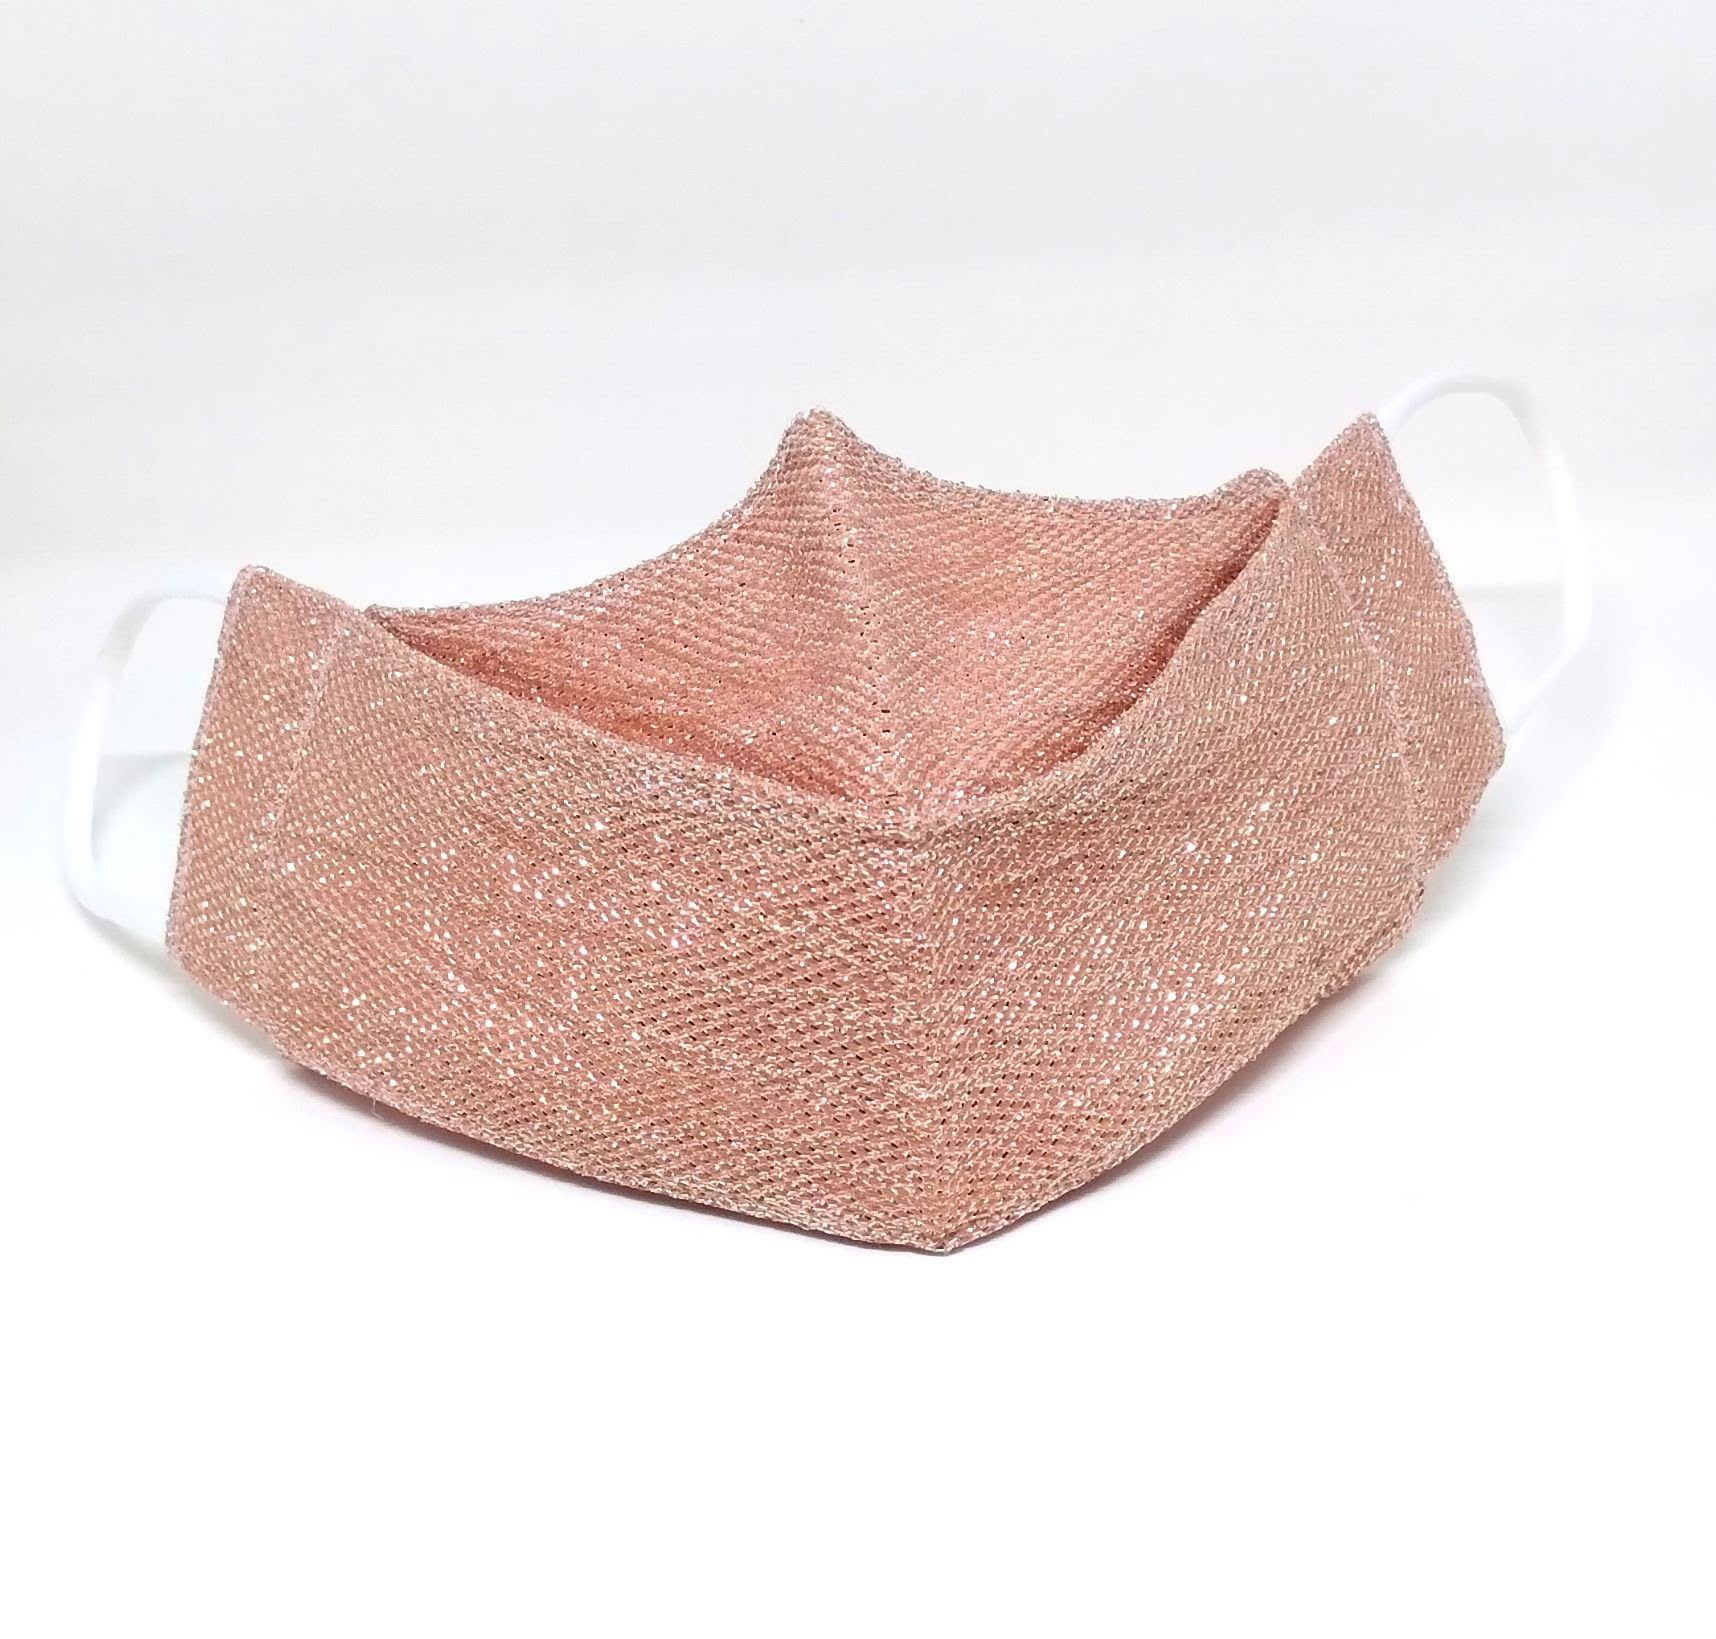 Máscara 3D Algodão Nude Rose Lurex Brilhoso Lavável